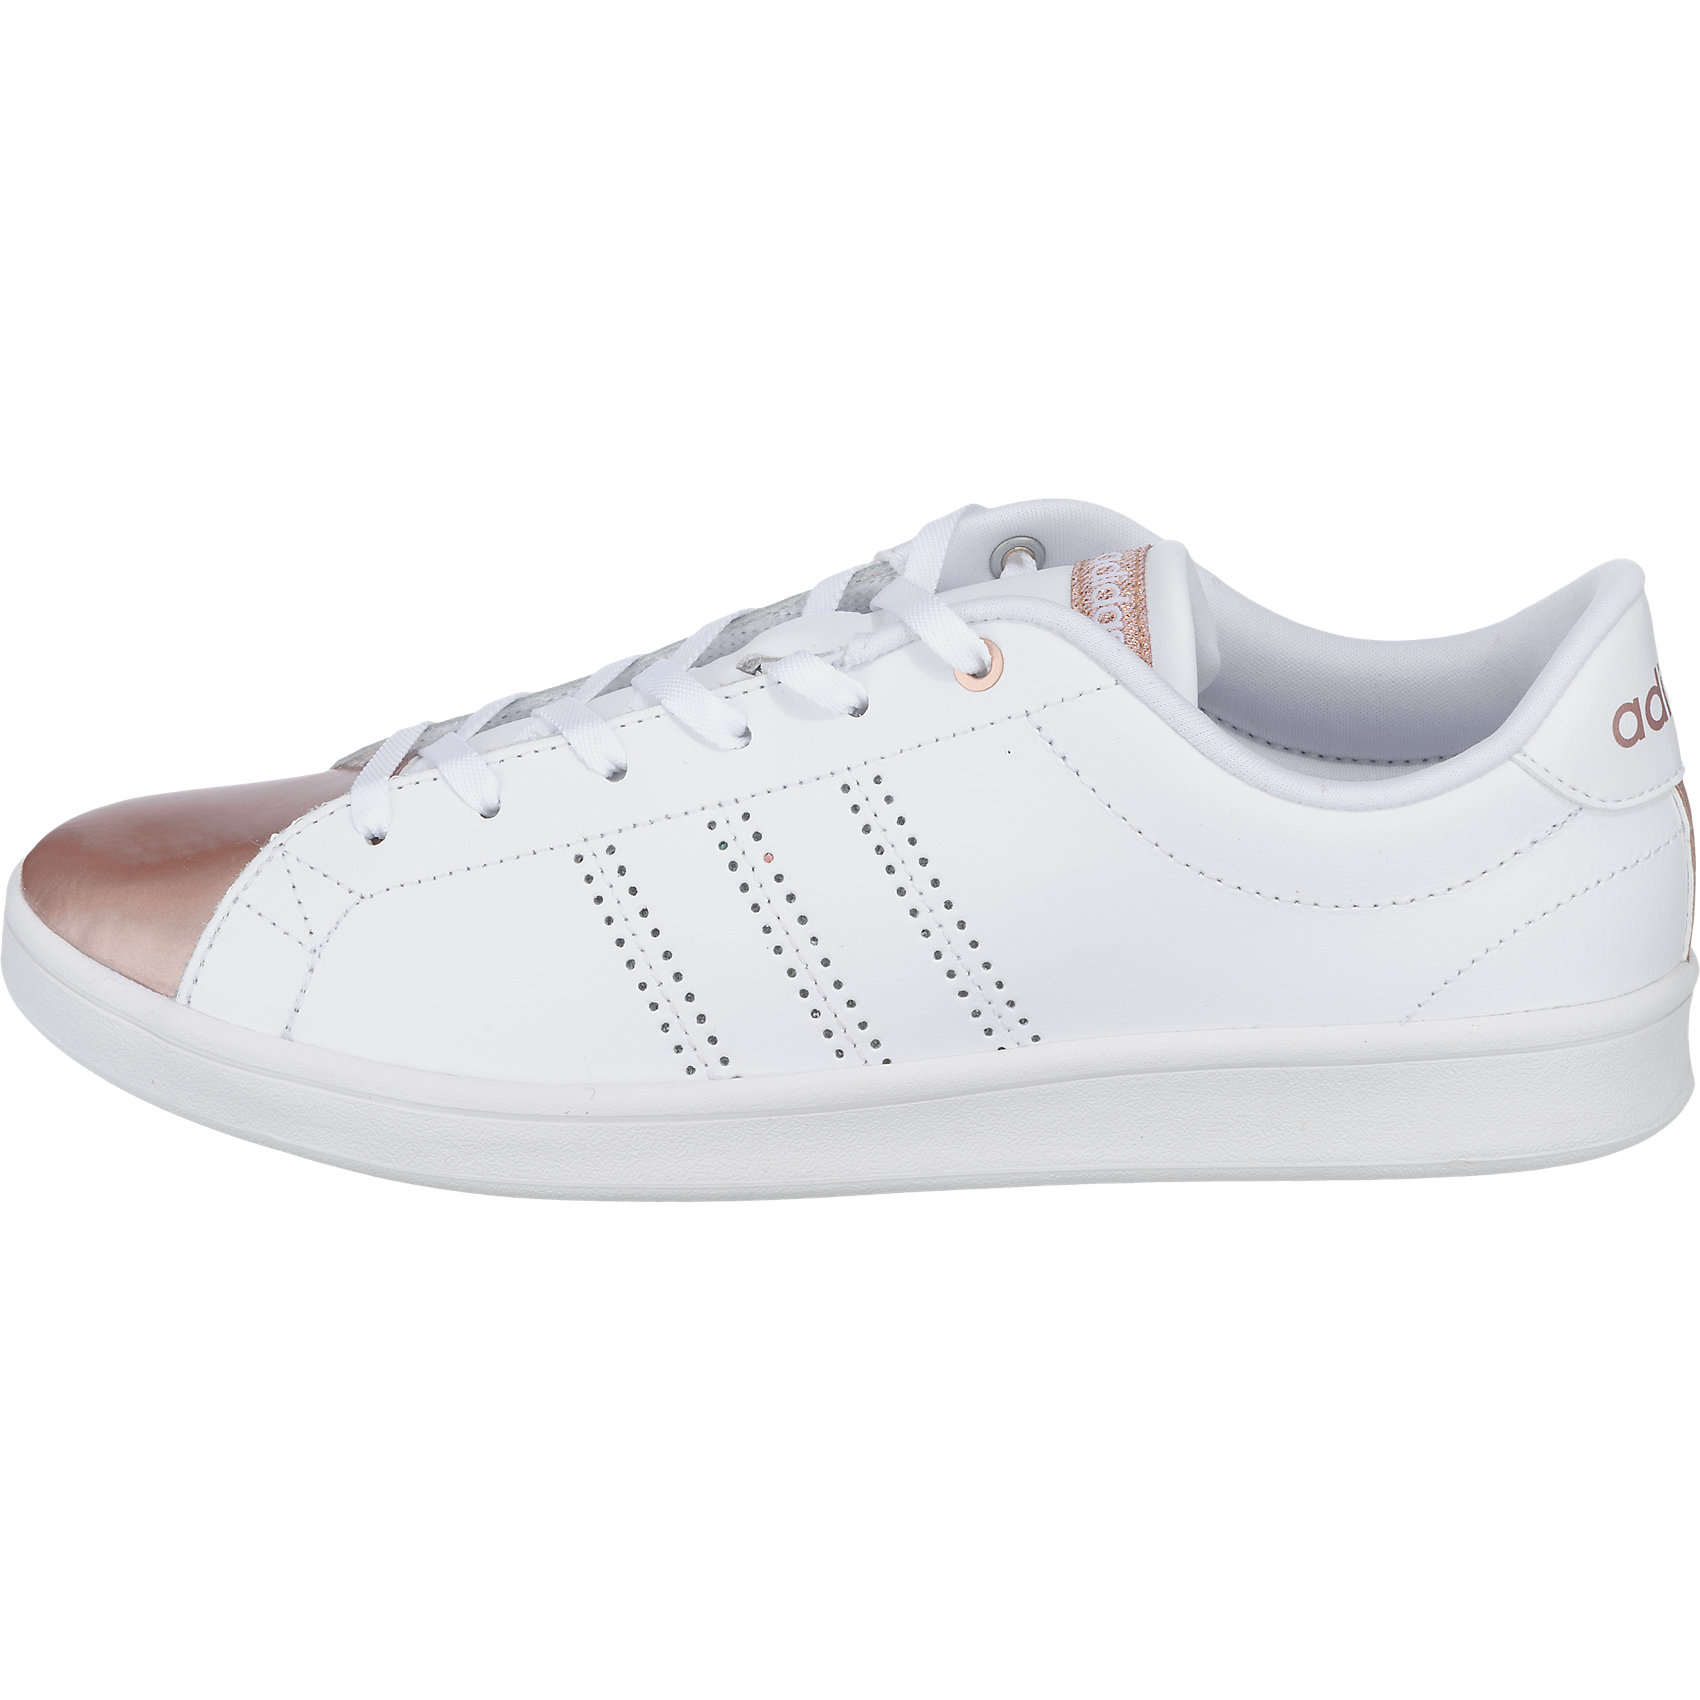 norway adidas neo clean advantage weiß b10e8 42698